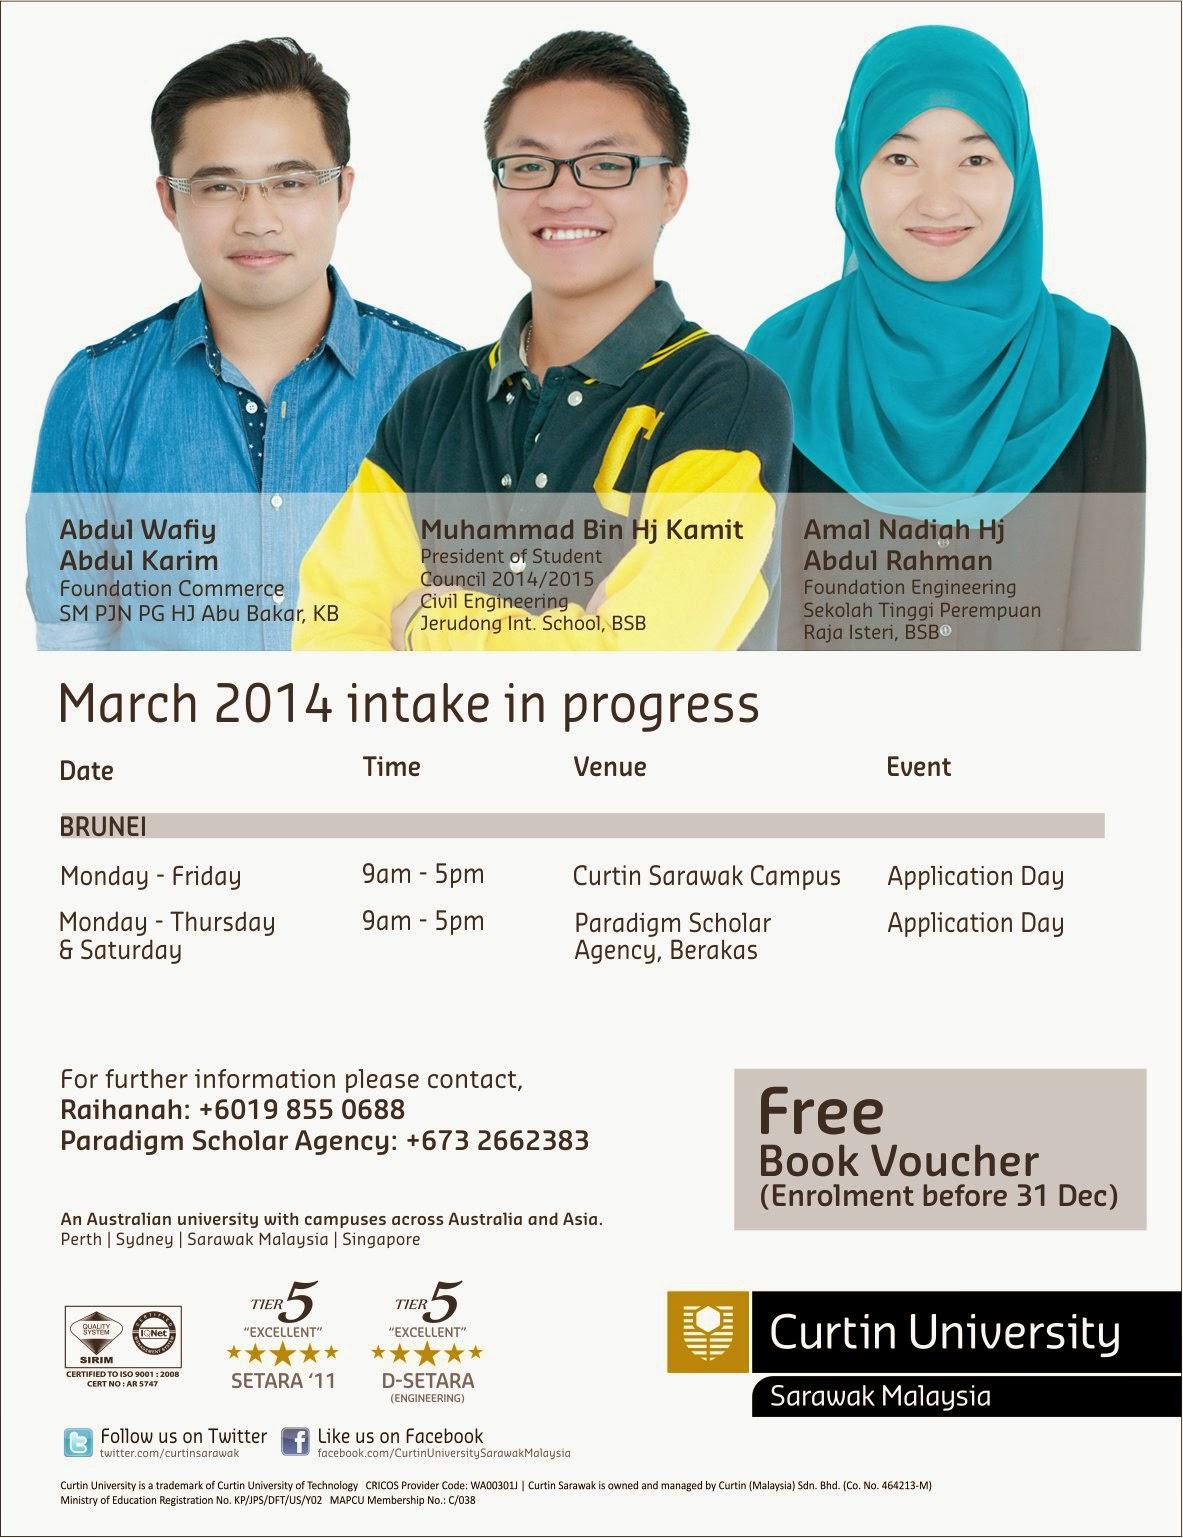 https://www.facebook.com/CurtinUniversitySarawakMalaysia